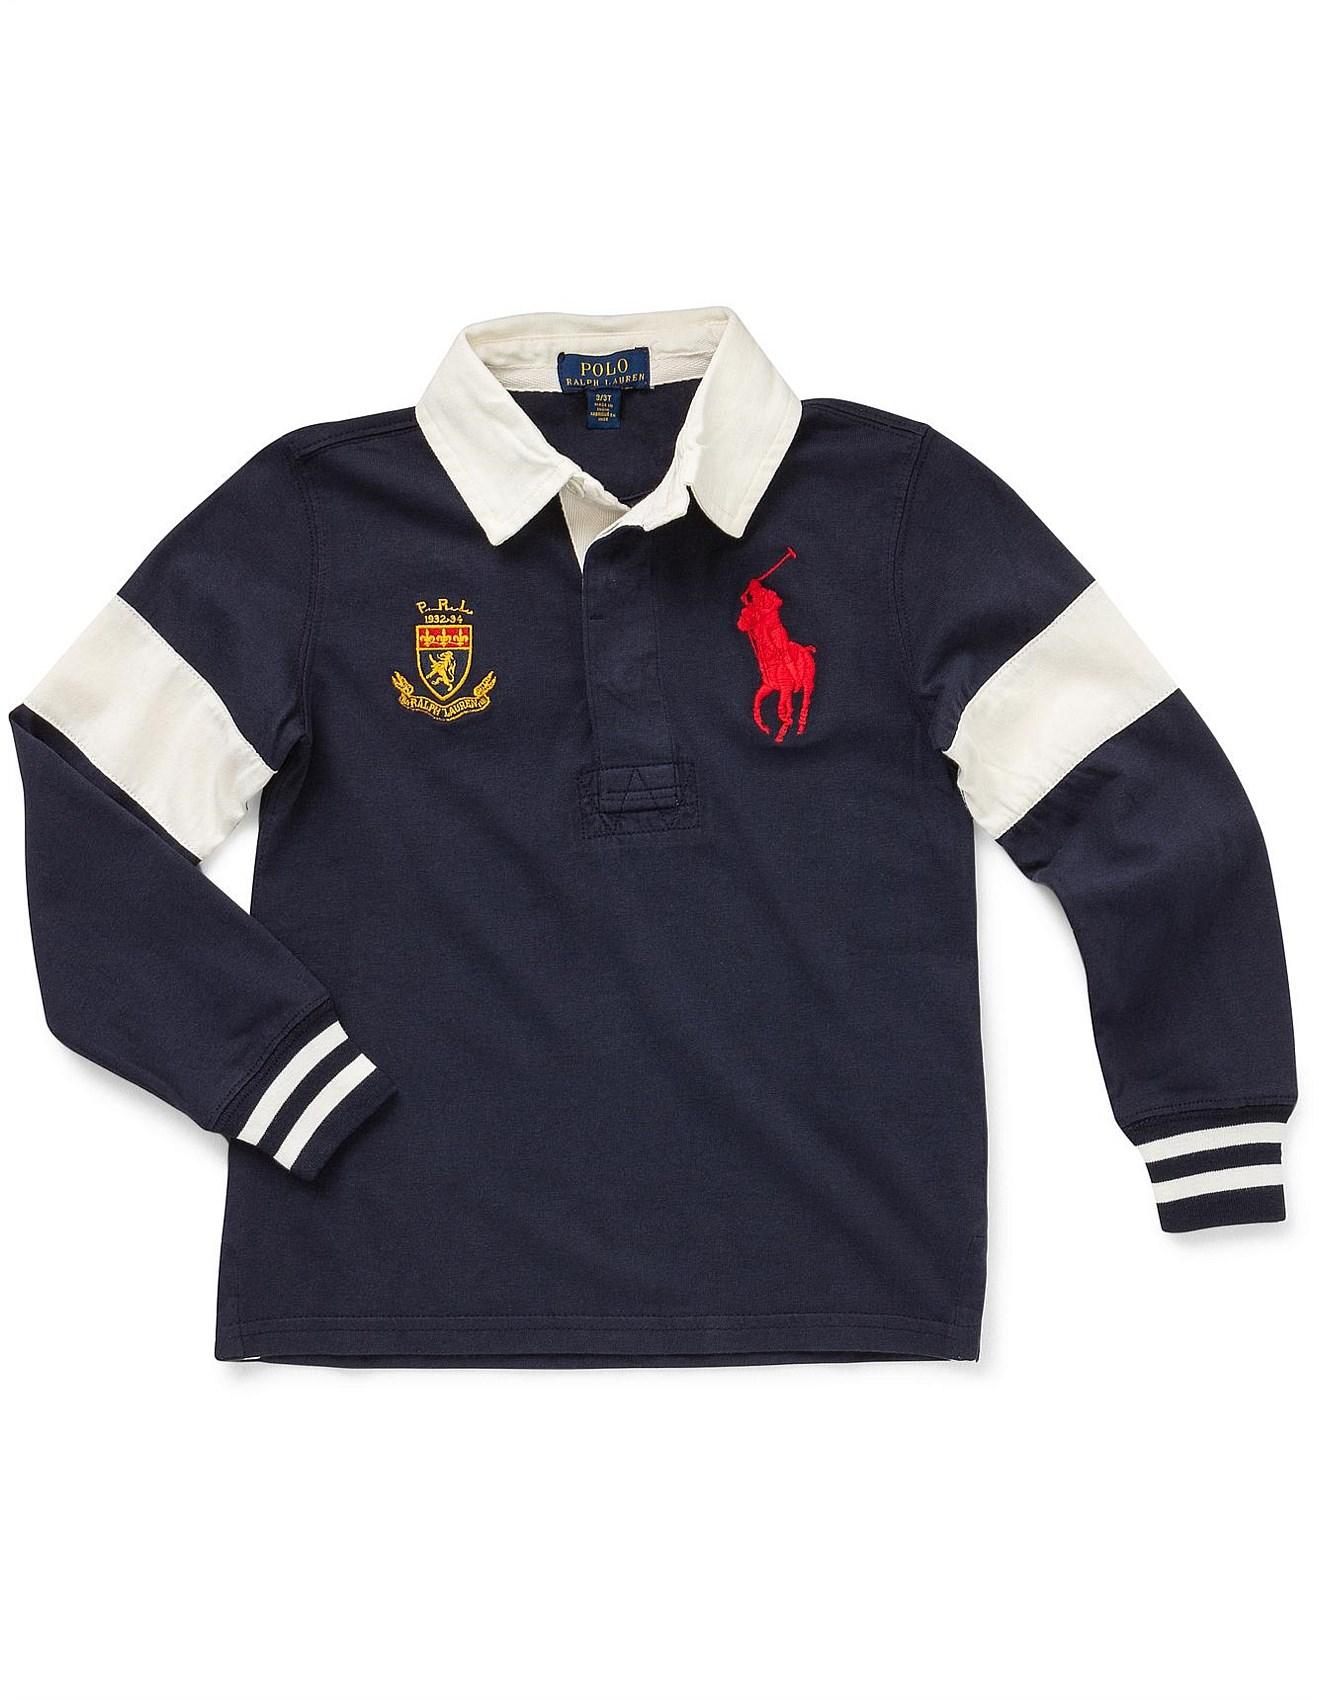 3beefb05533 Boy's Tops & T-Shirts   Boy's 2-7   David Jones - Big Pony Cotton ...